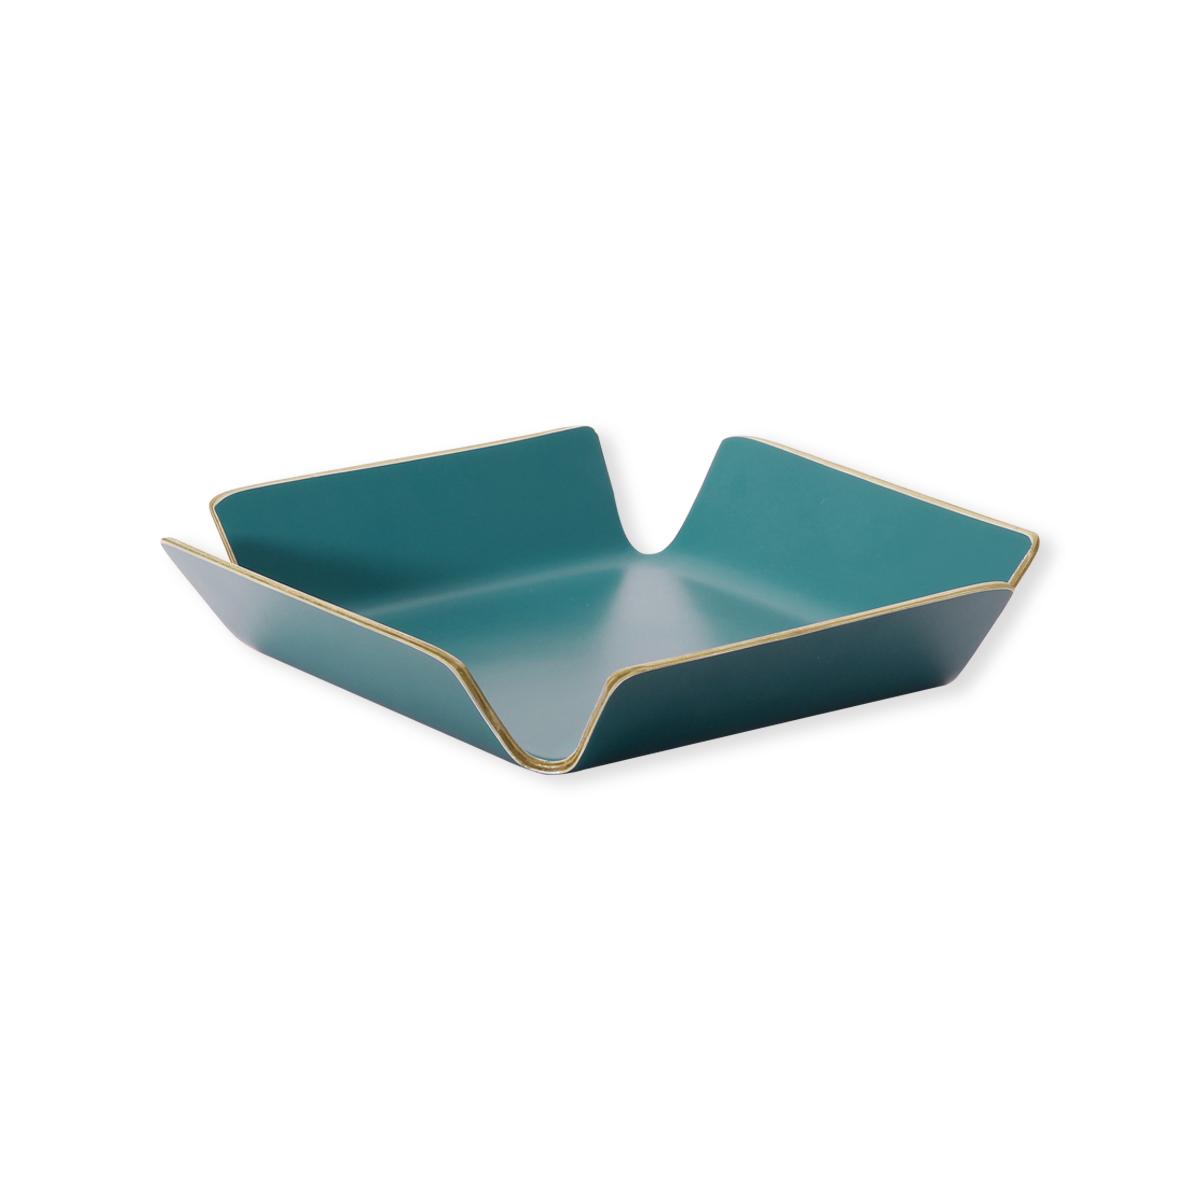 corbeille pain design en bois bleu canard vaisselle tendance. Black Bedroom Furniture Sets. Home Design Ideas